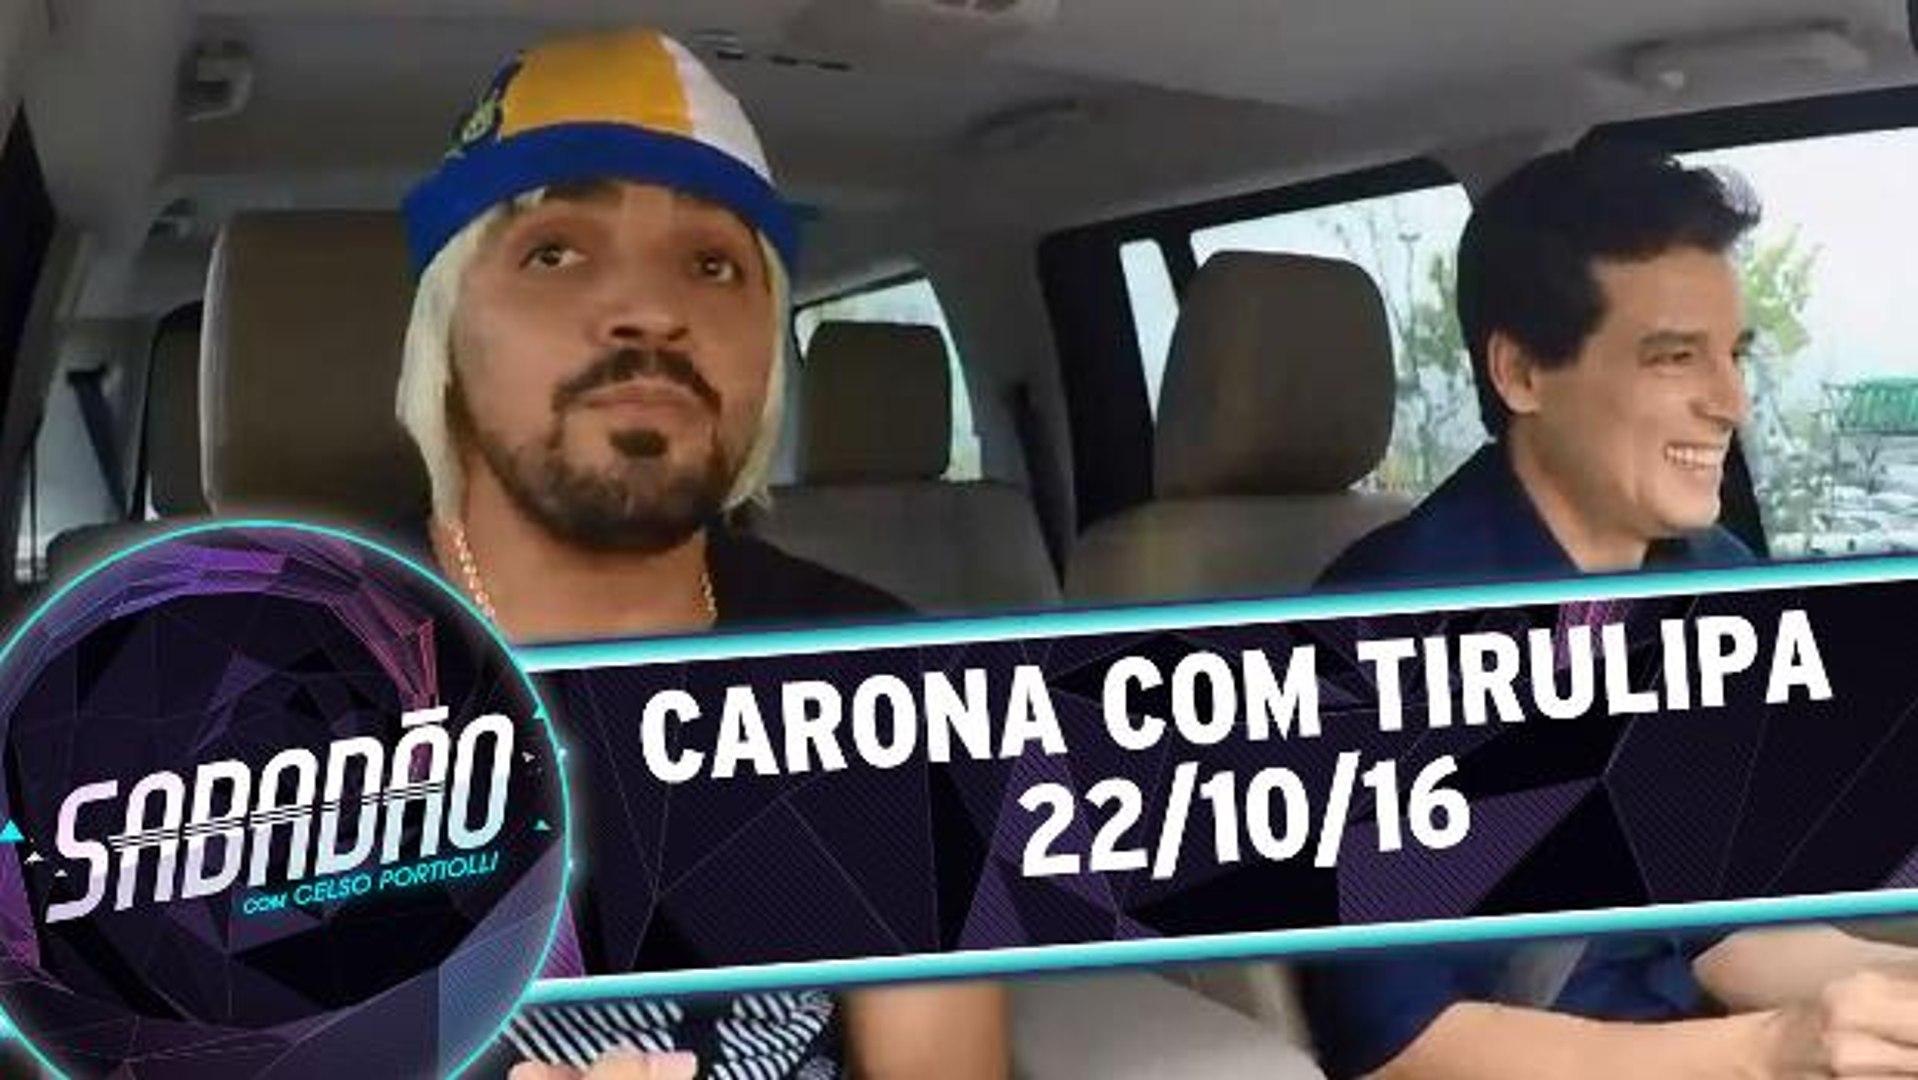 Celso Portiolli dá carona para Tirulipa